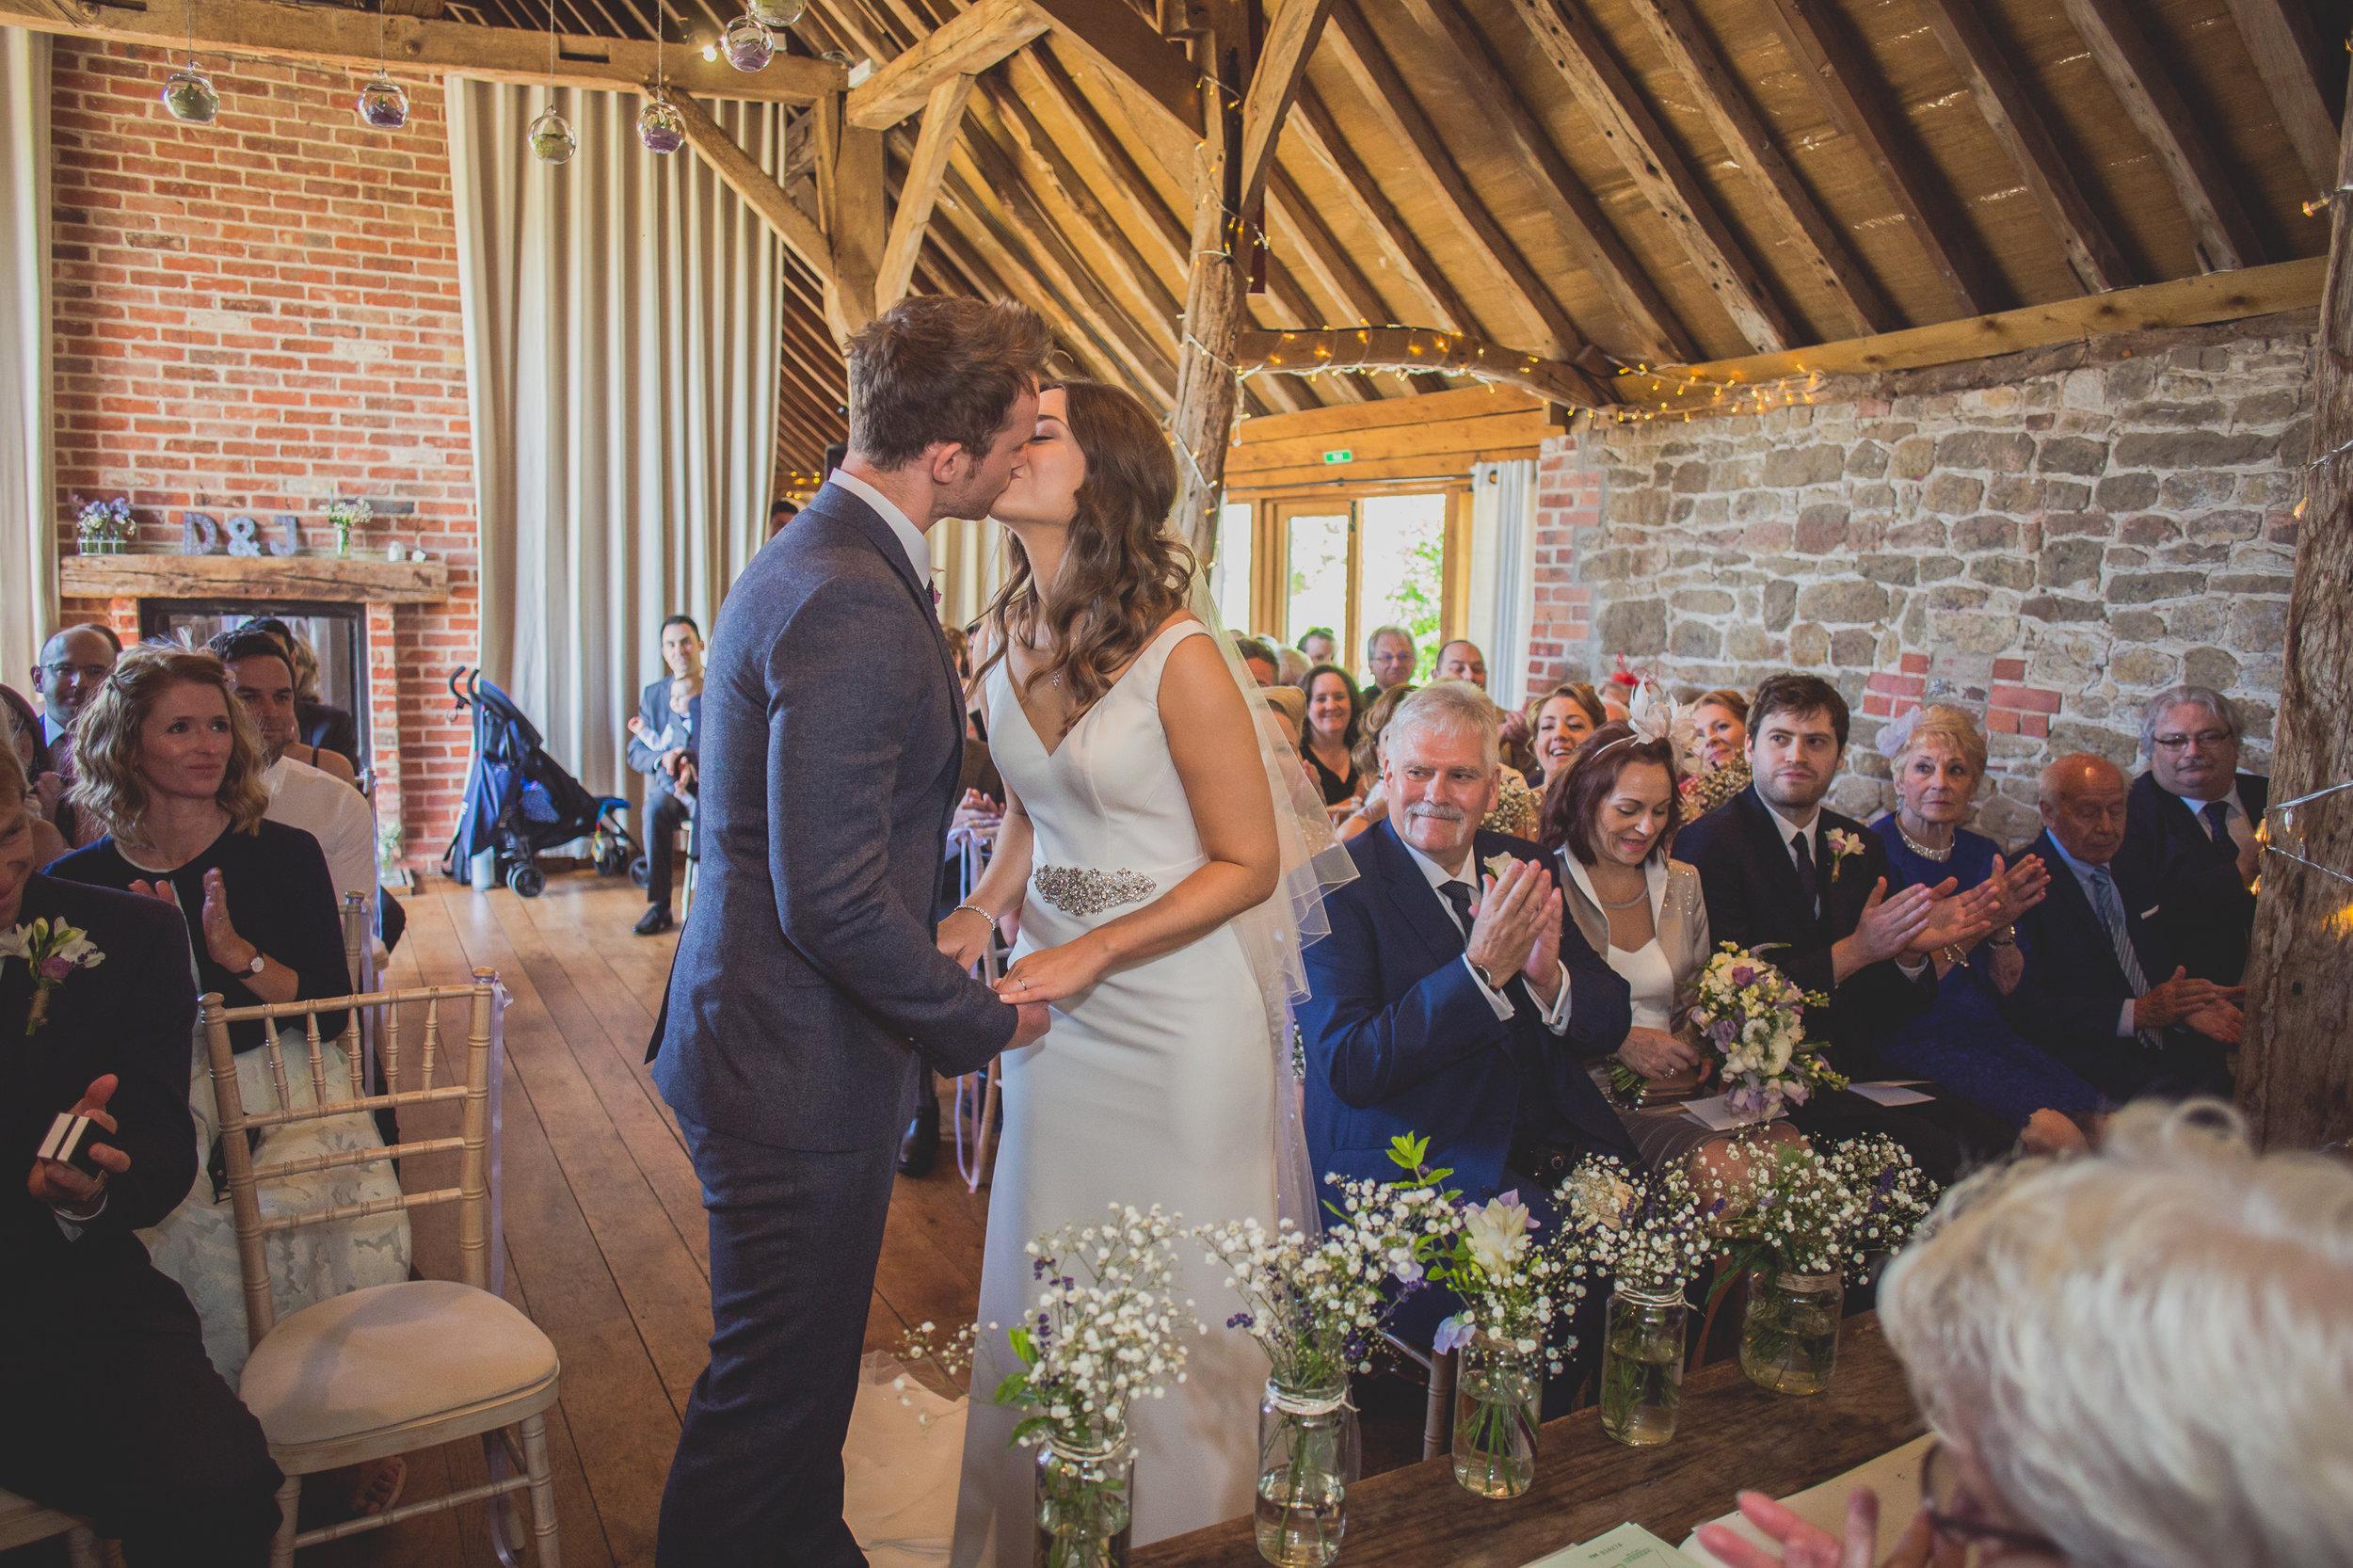 Grittenham Barn female wedding photographers west sussex petworth social-61.jpg